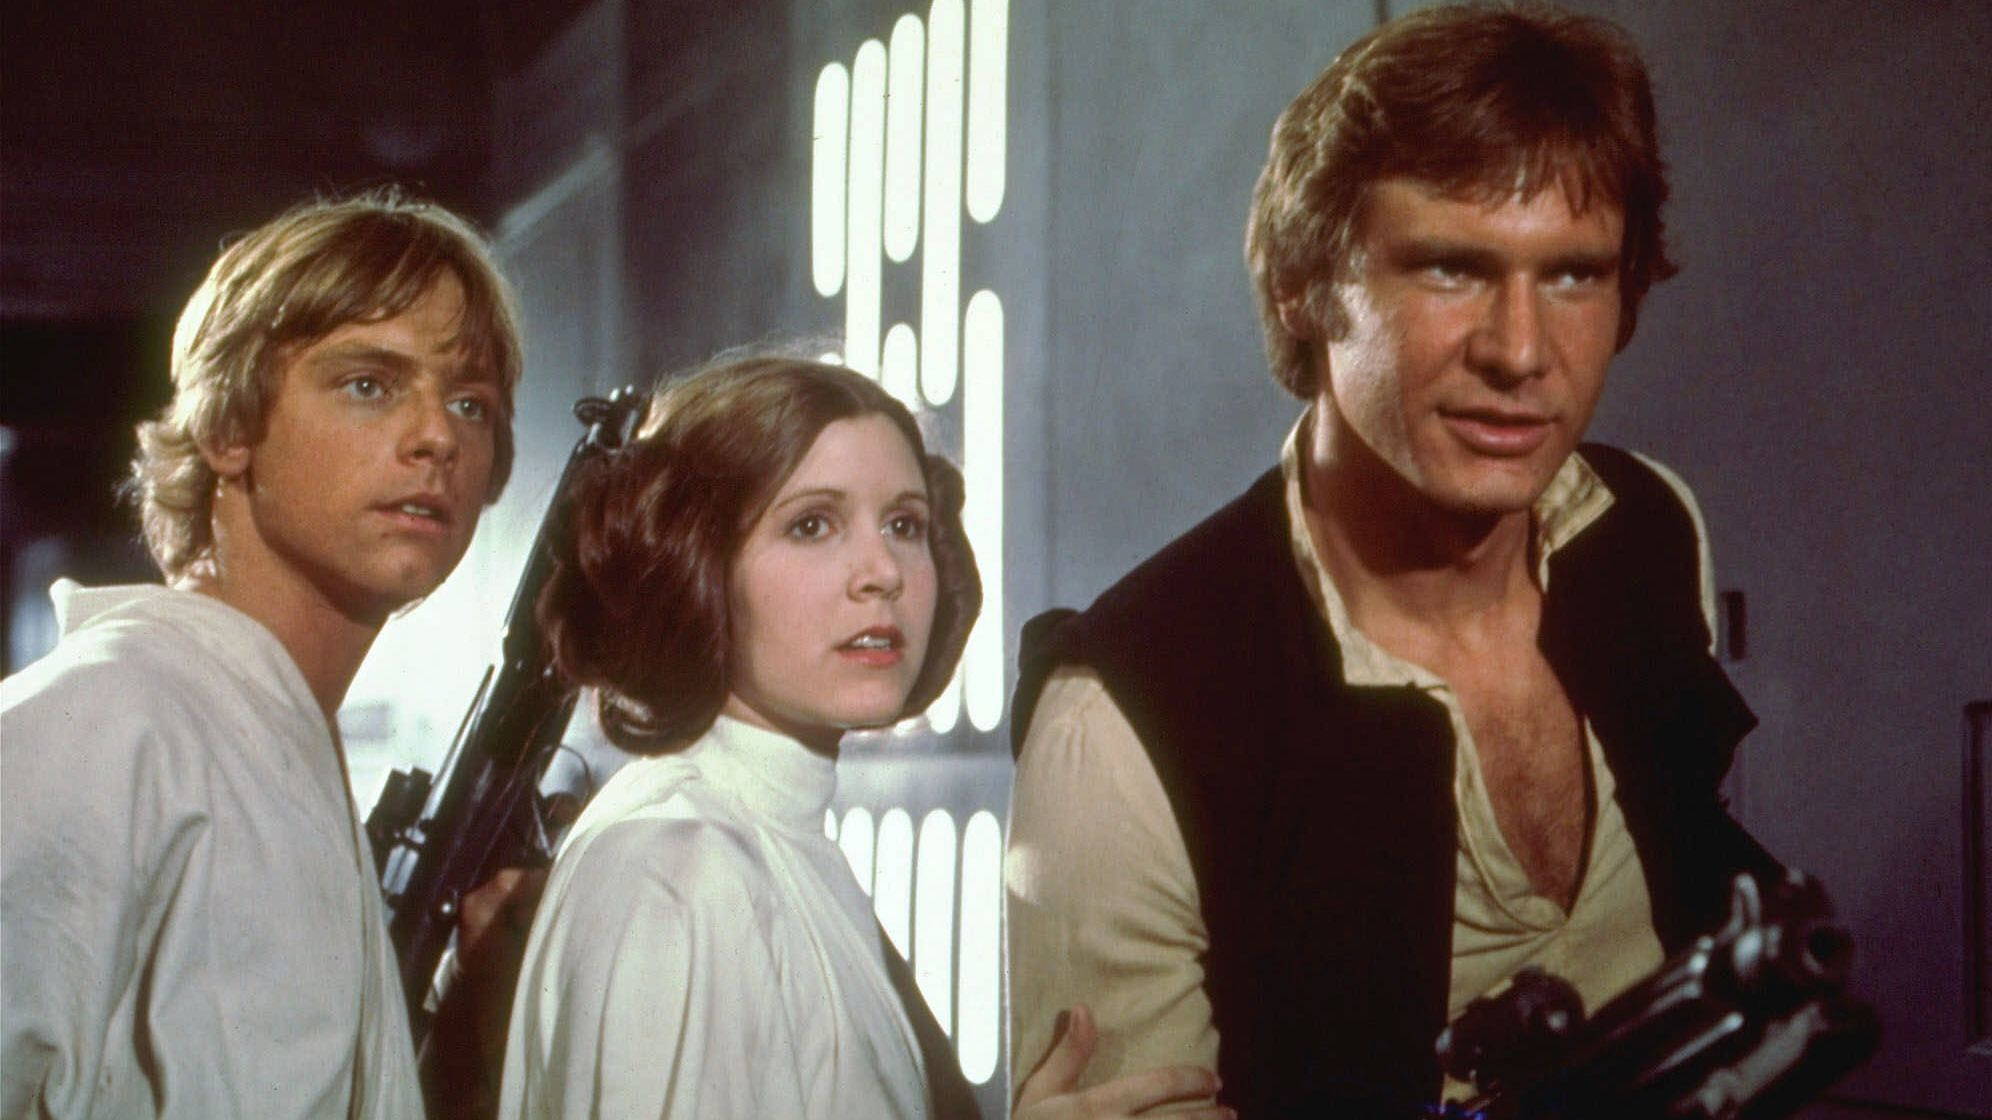 'Star Wars'